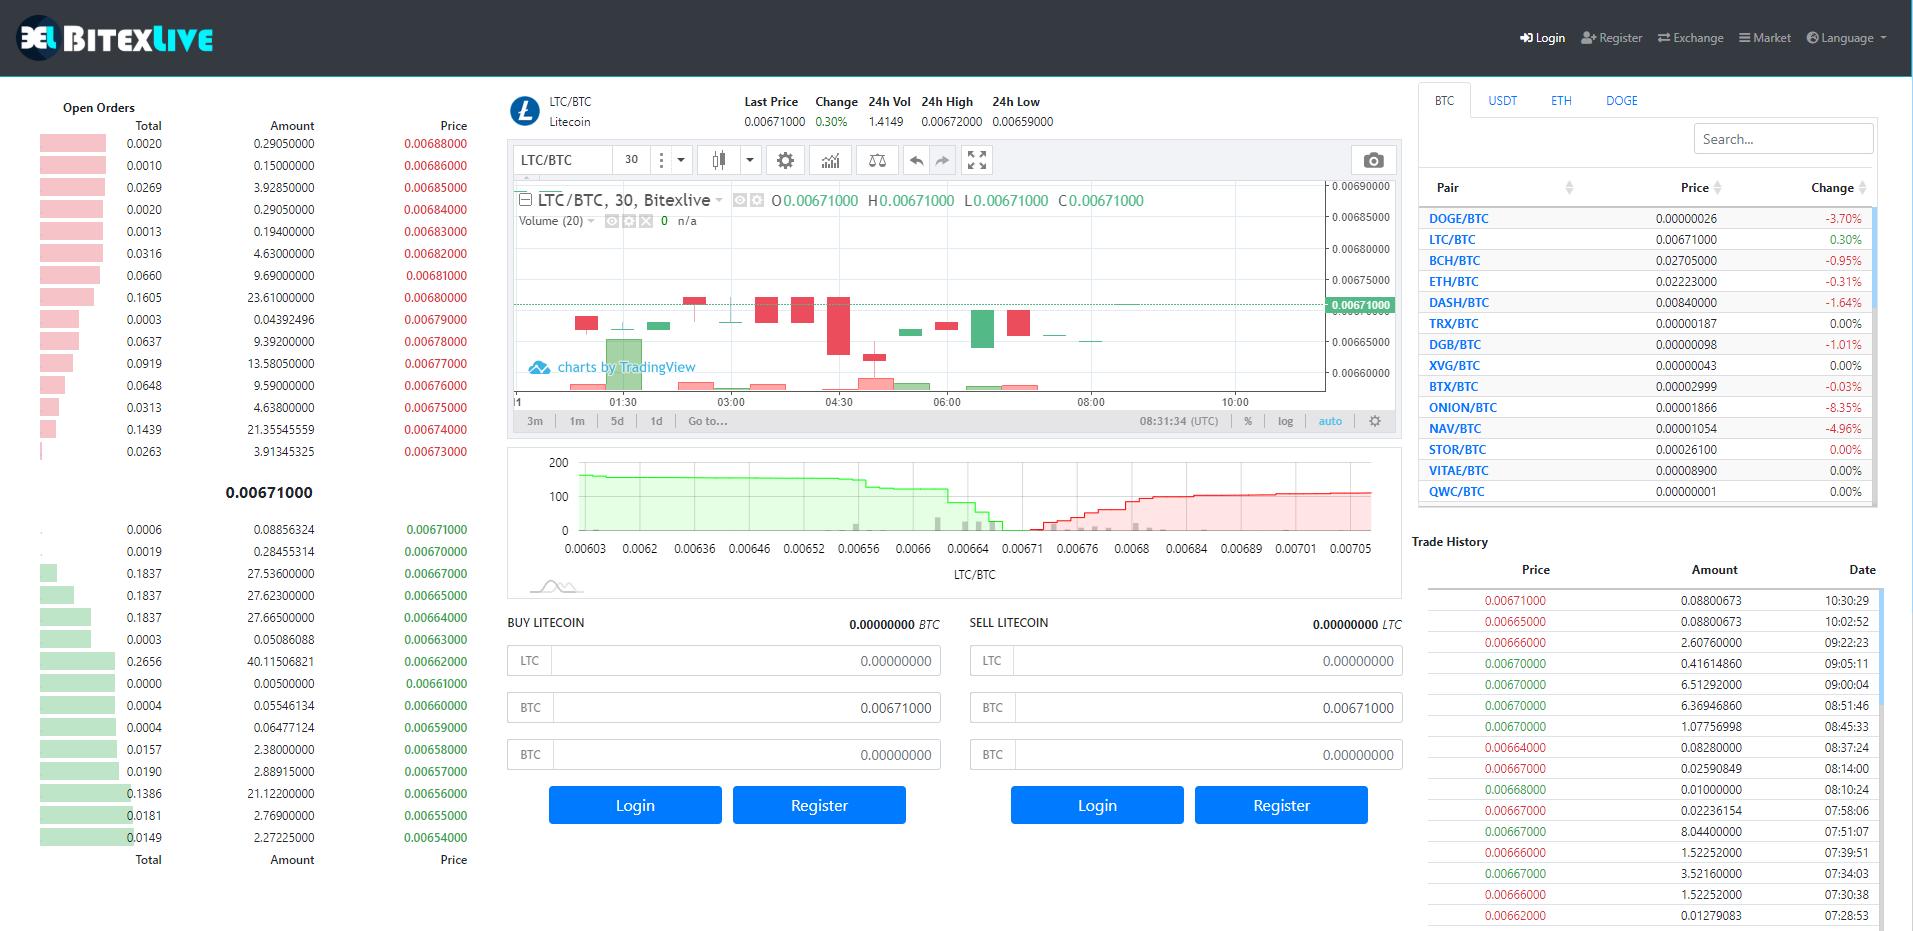 Bitexlive Trading View